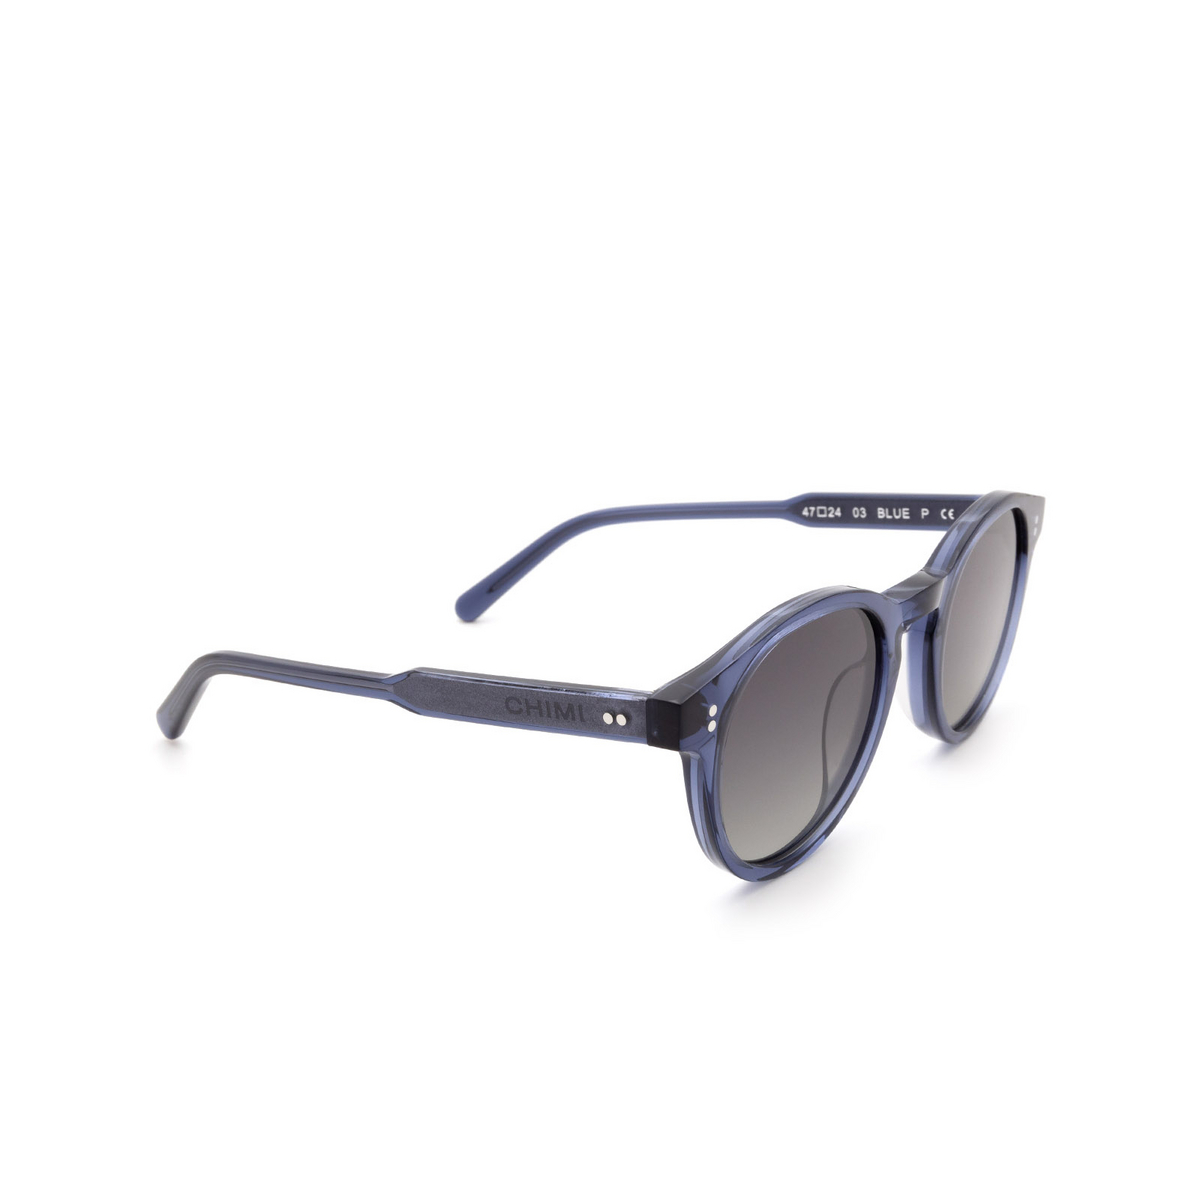 Chimi® Round Sunglasses: 03 color Blue - three-quarters view.